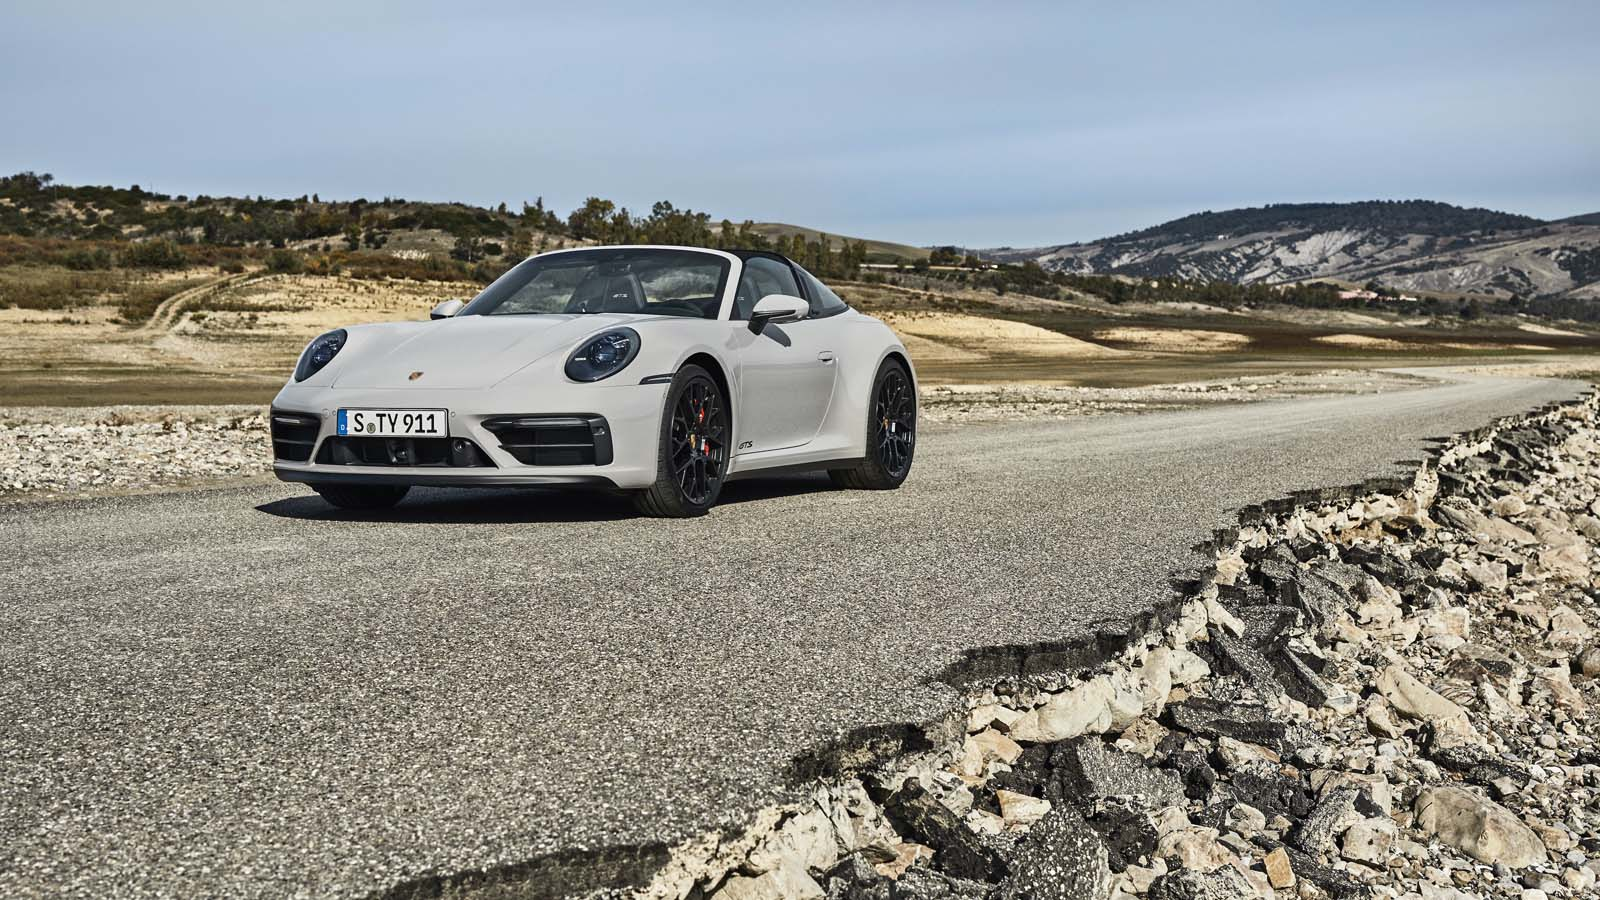 992 Porsche 911 GTS | Photo: Porsche